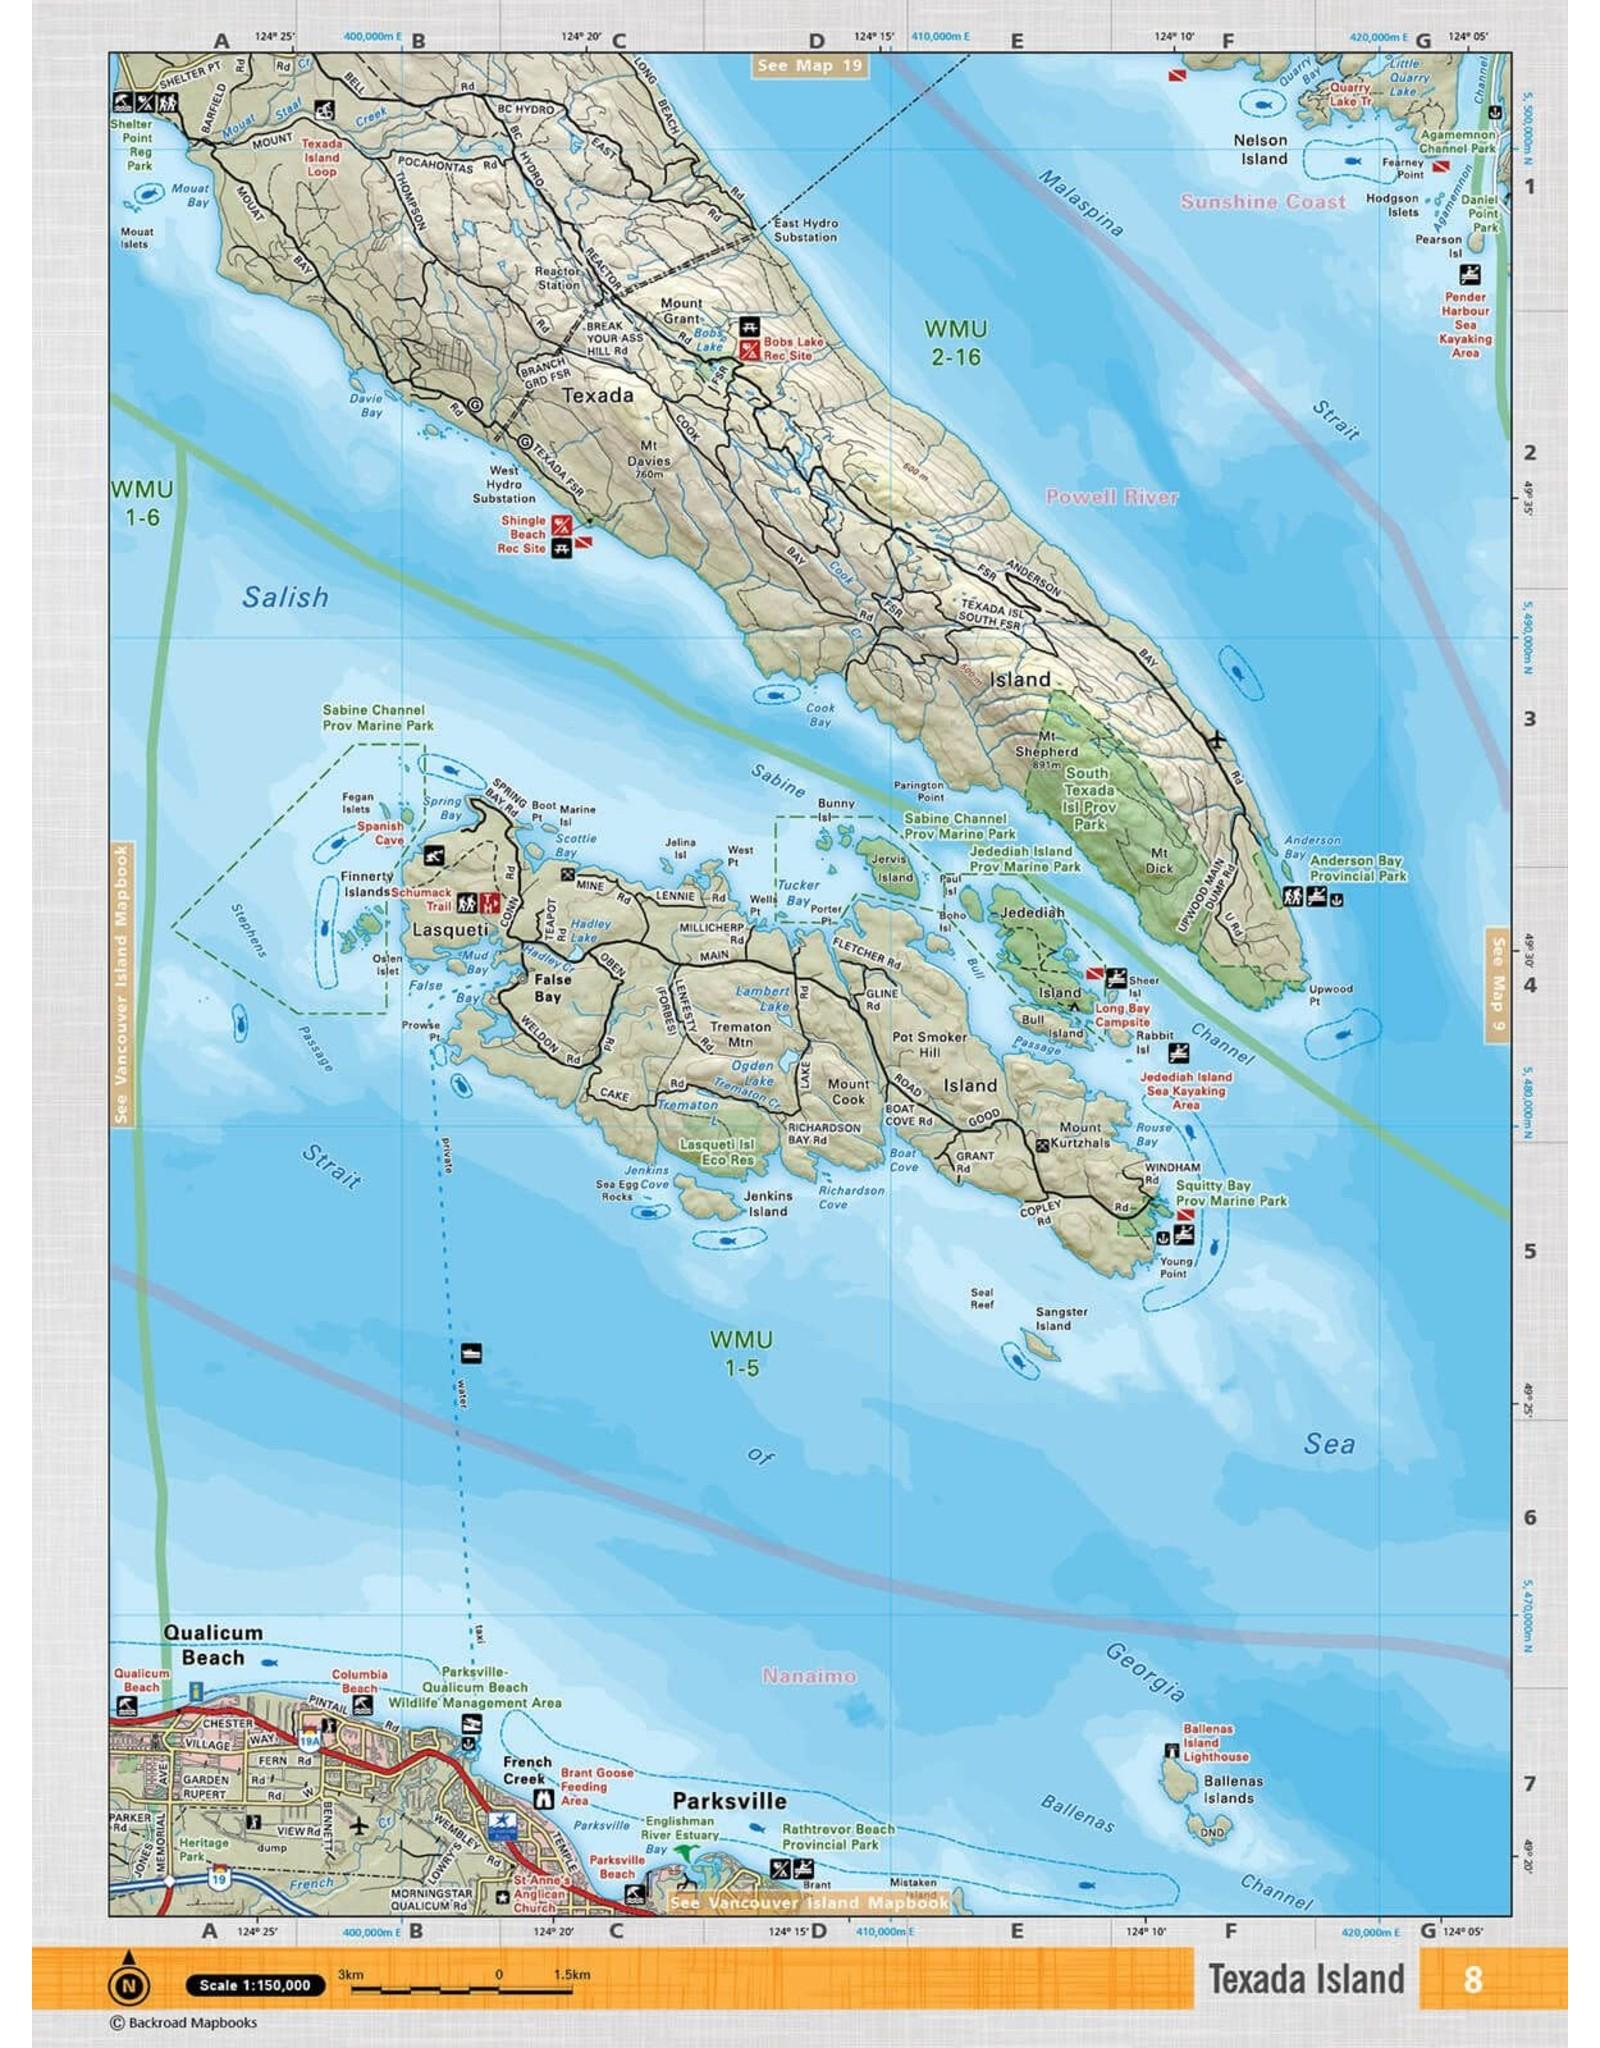 BACKROAD MAPBOOKS BRMB - VCBC8 - TEXADA ISLAND